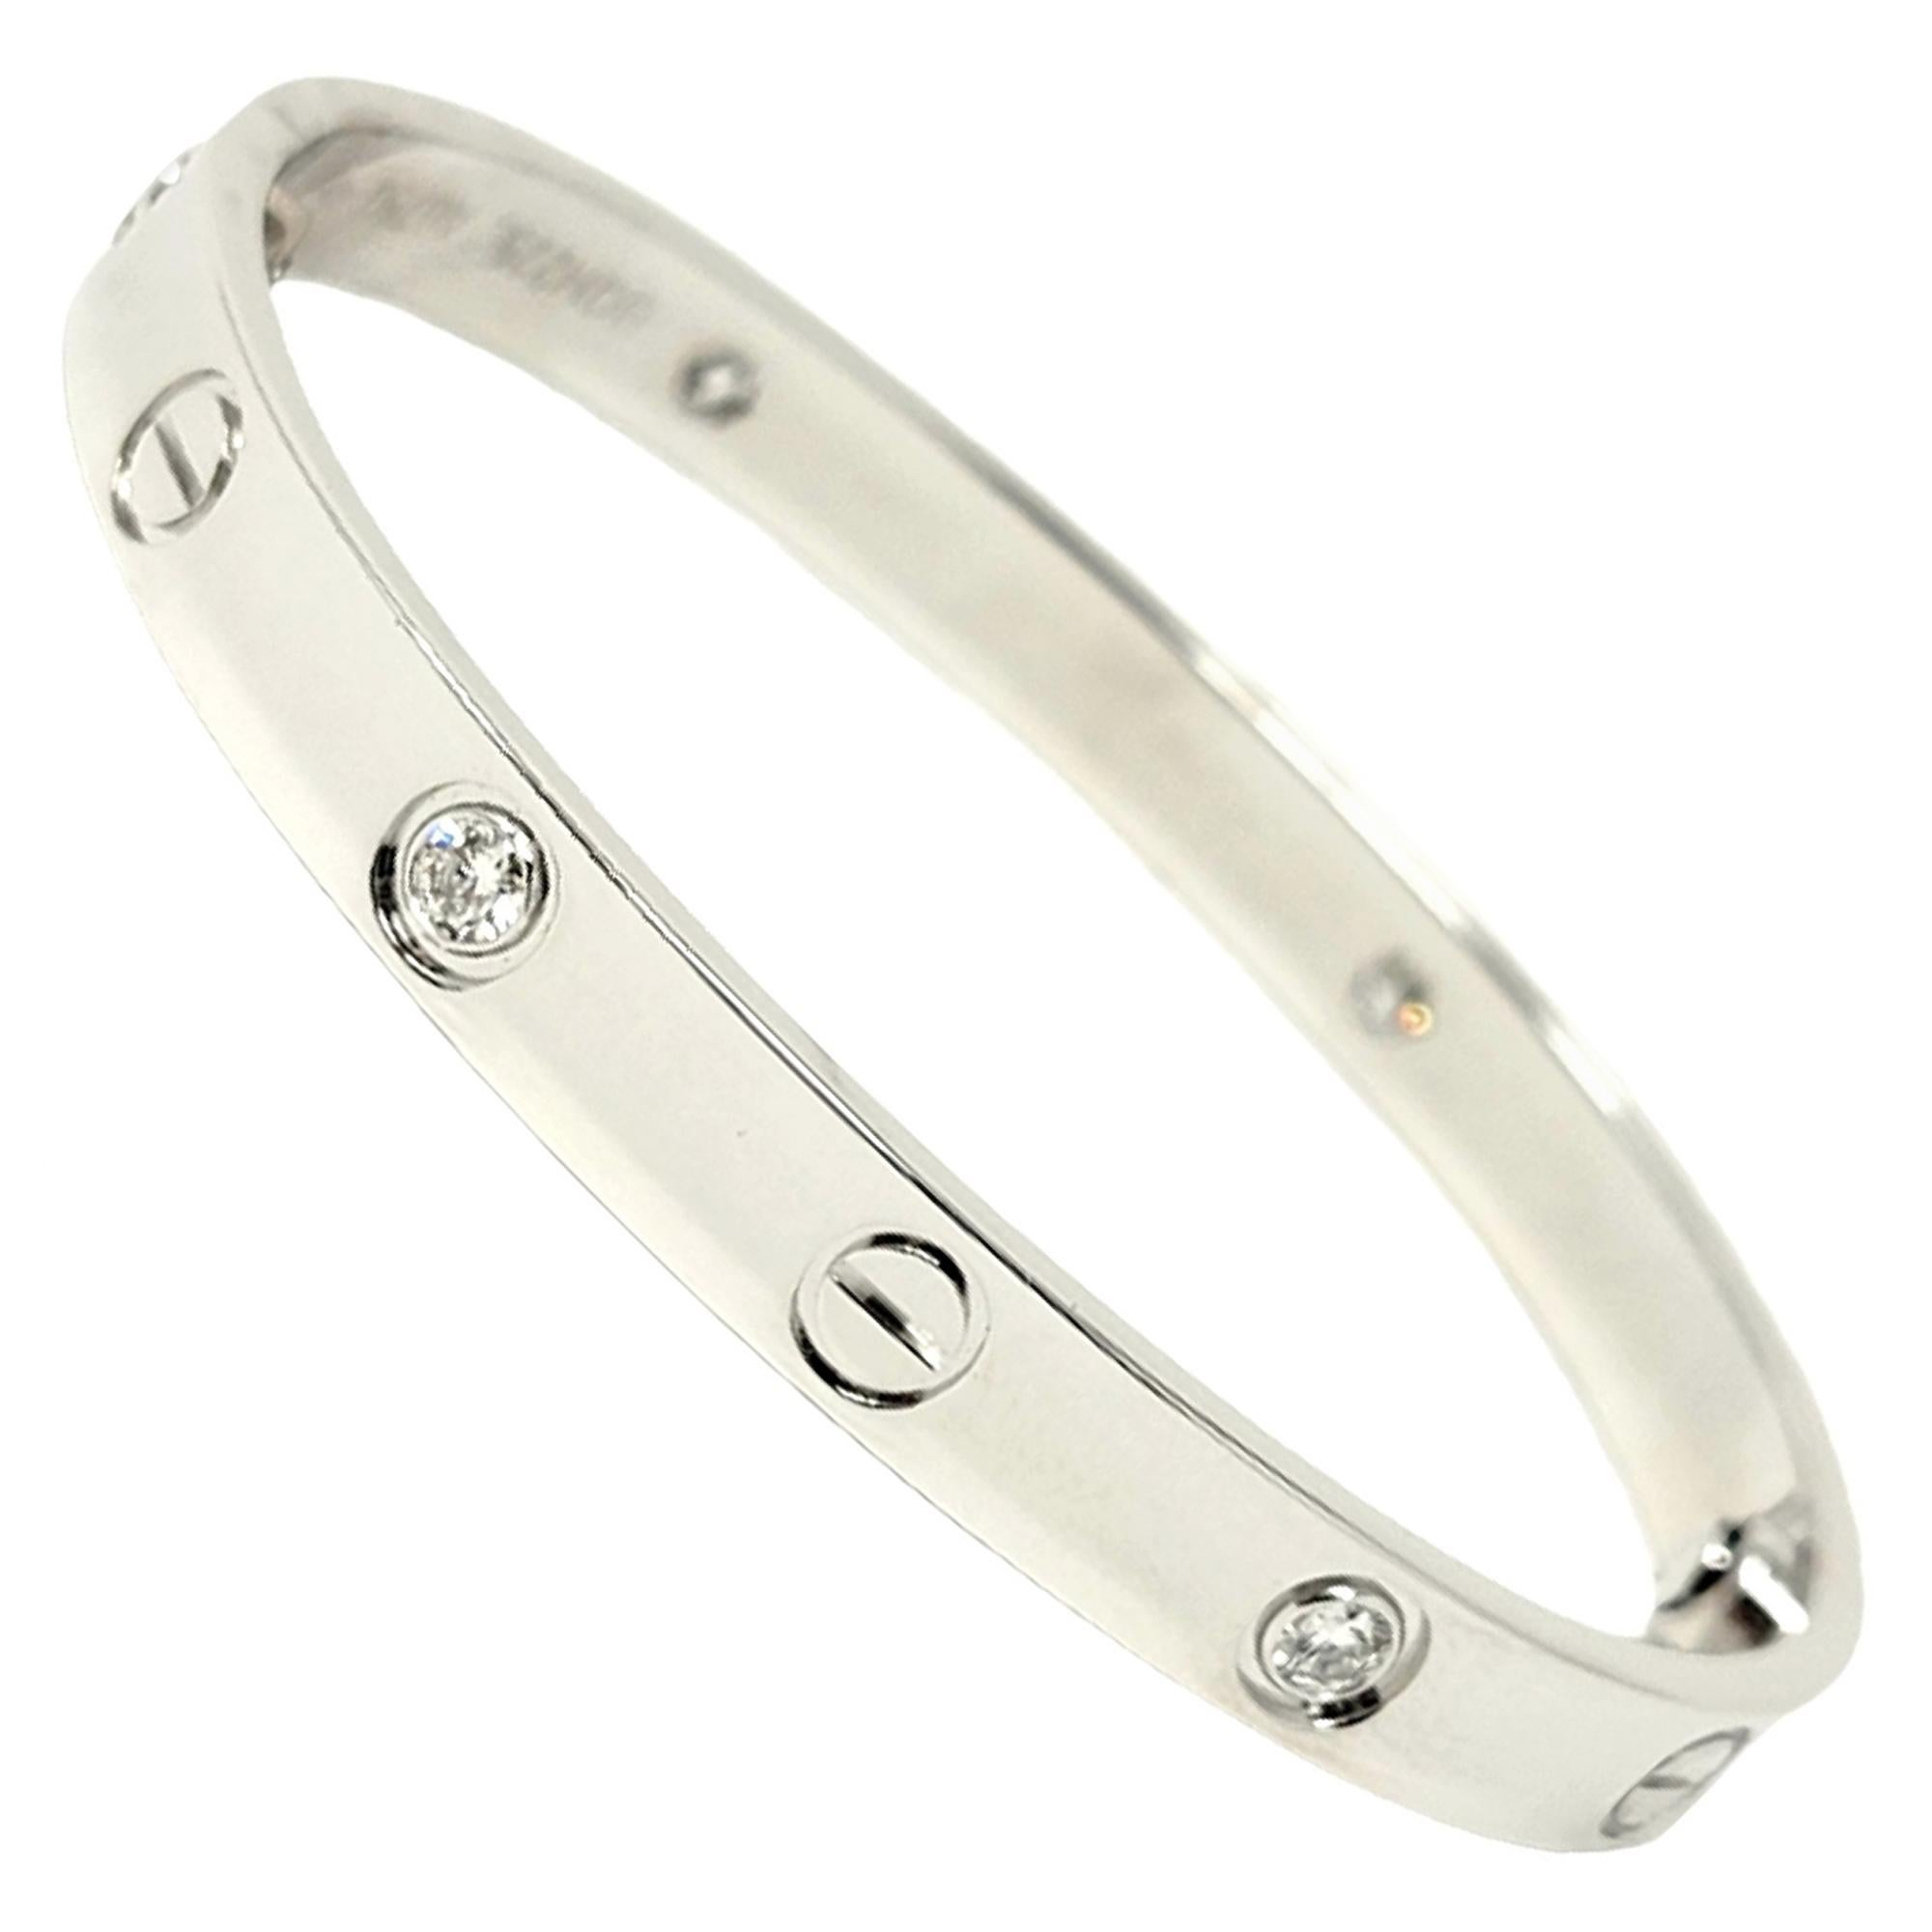 Cartier Love Collection 18 Karat White Gold and 4 Diamond Bangle Bracelet 16